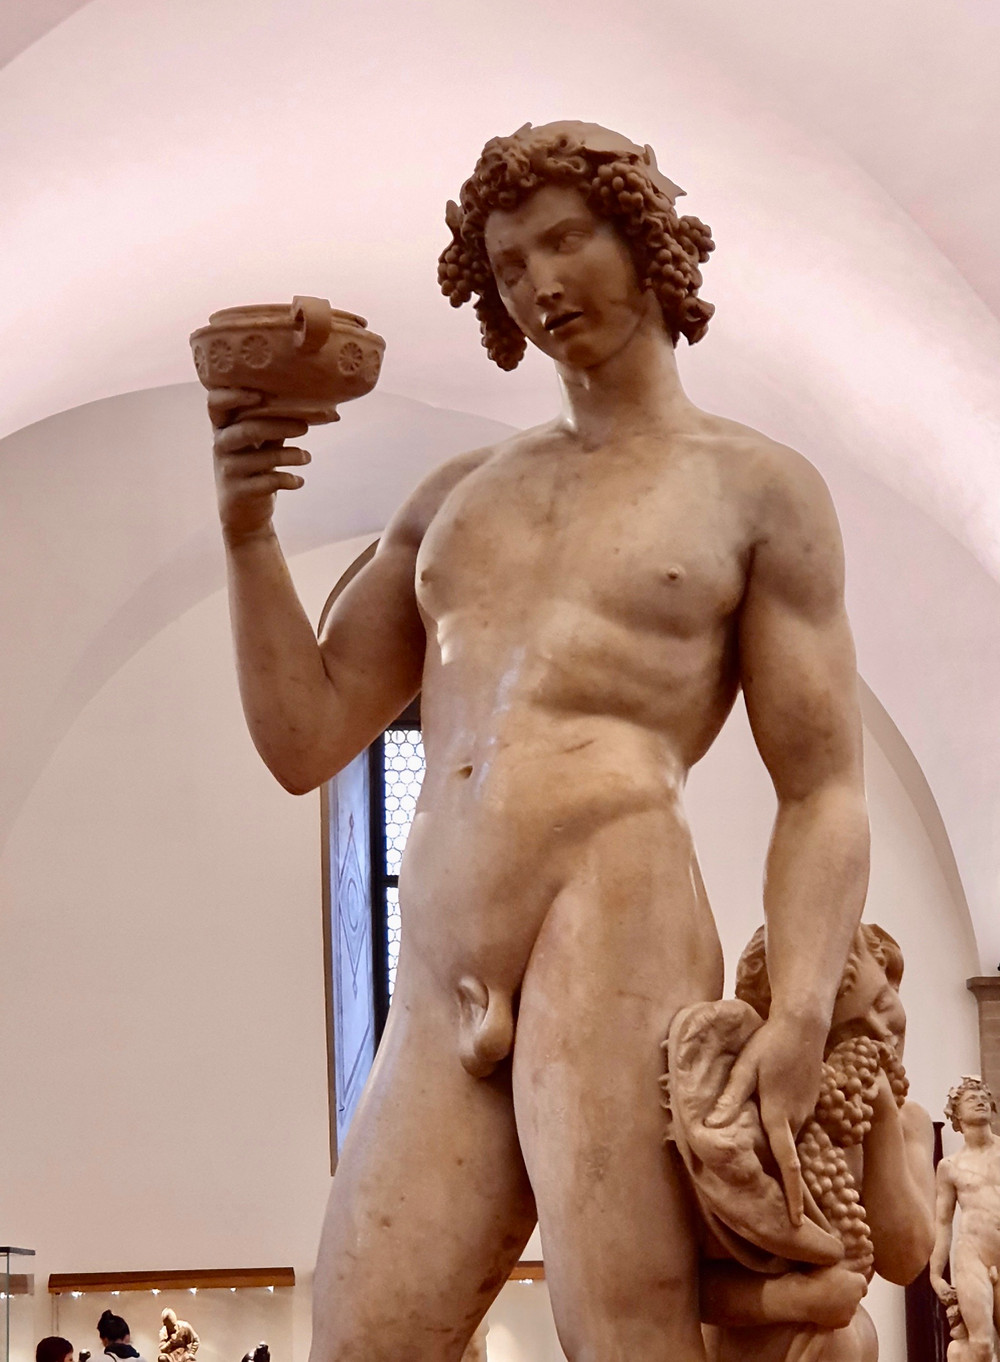 Michelangelo, Bacchus, 1496-97